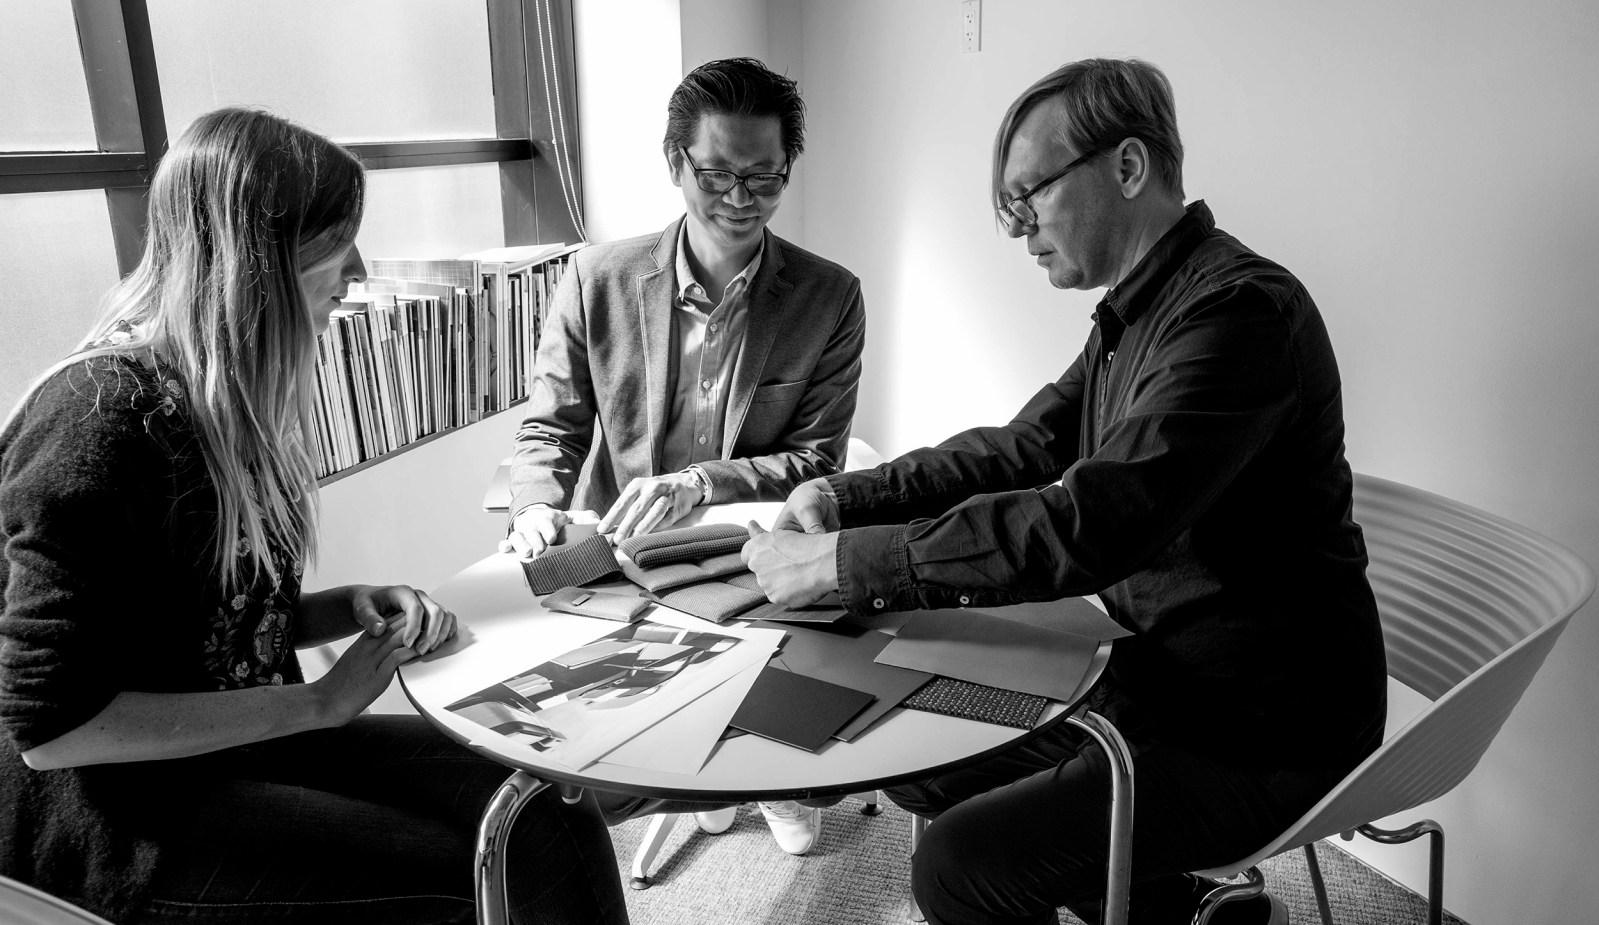 eva seats process team discussion